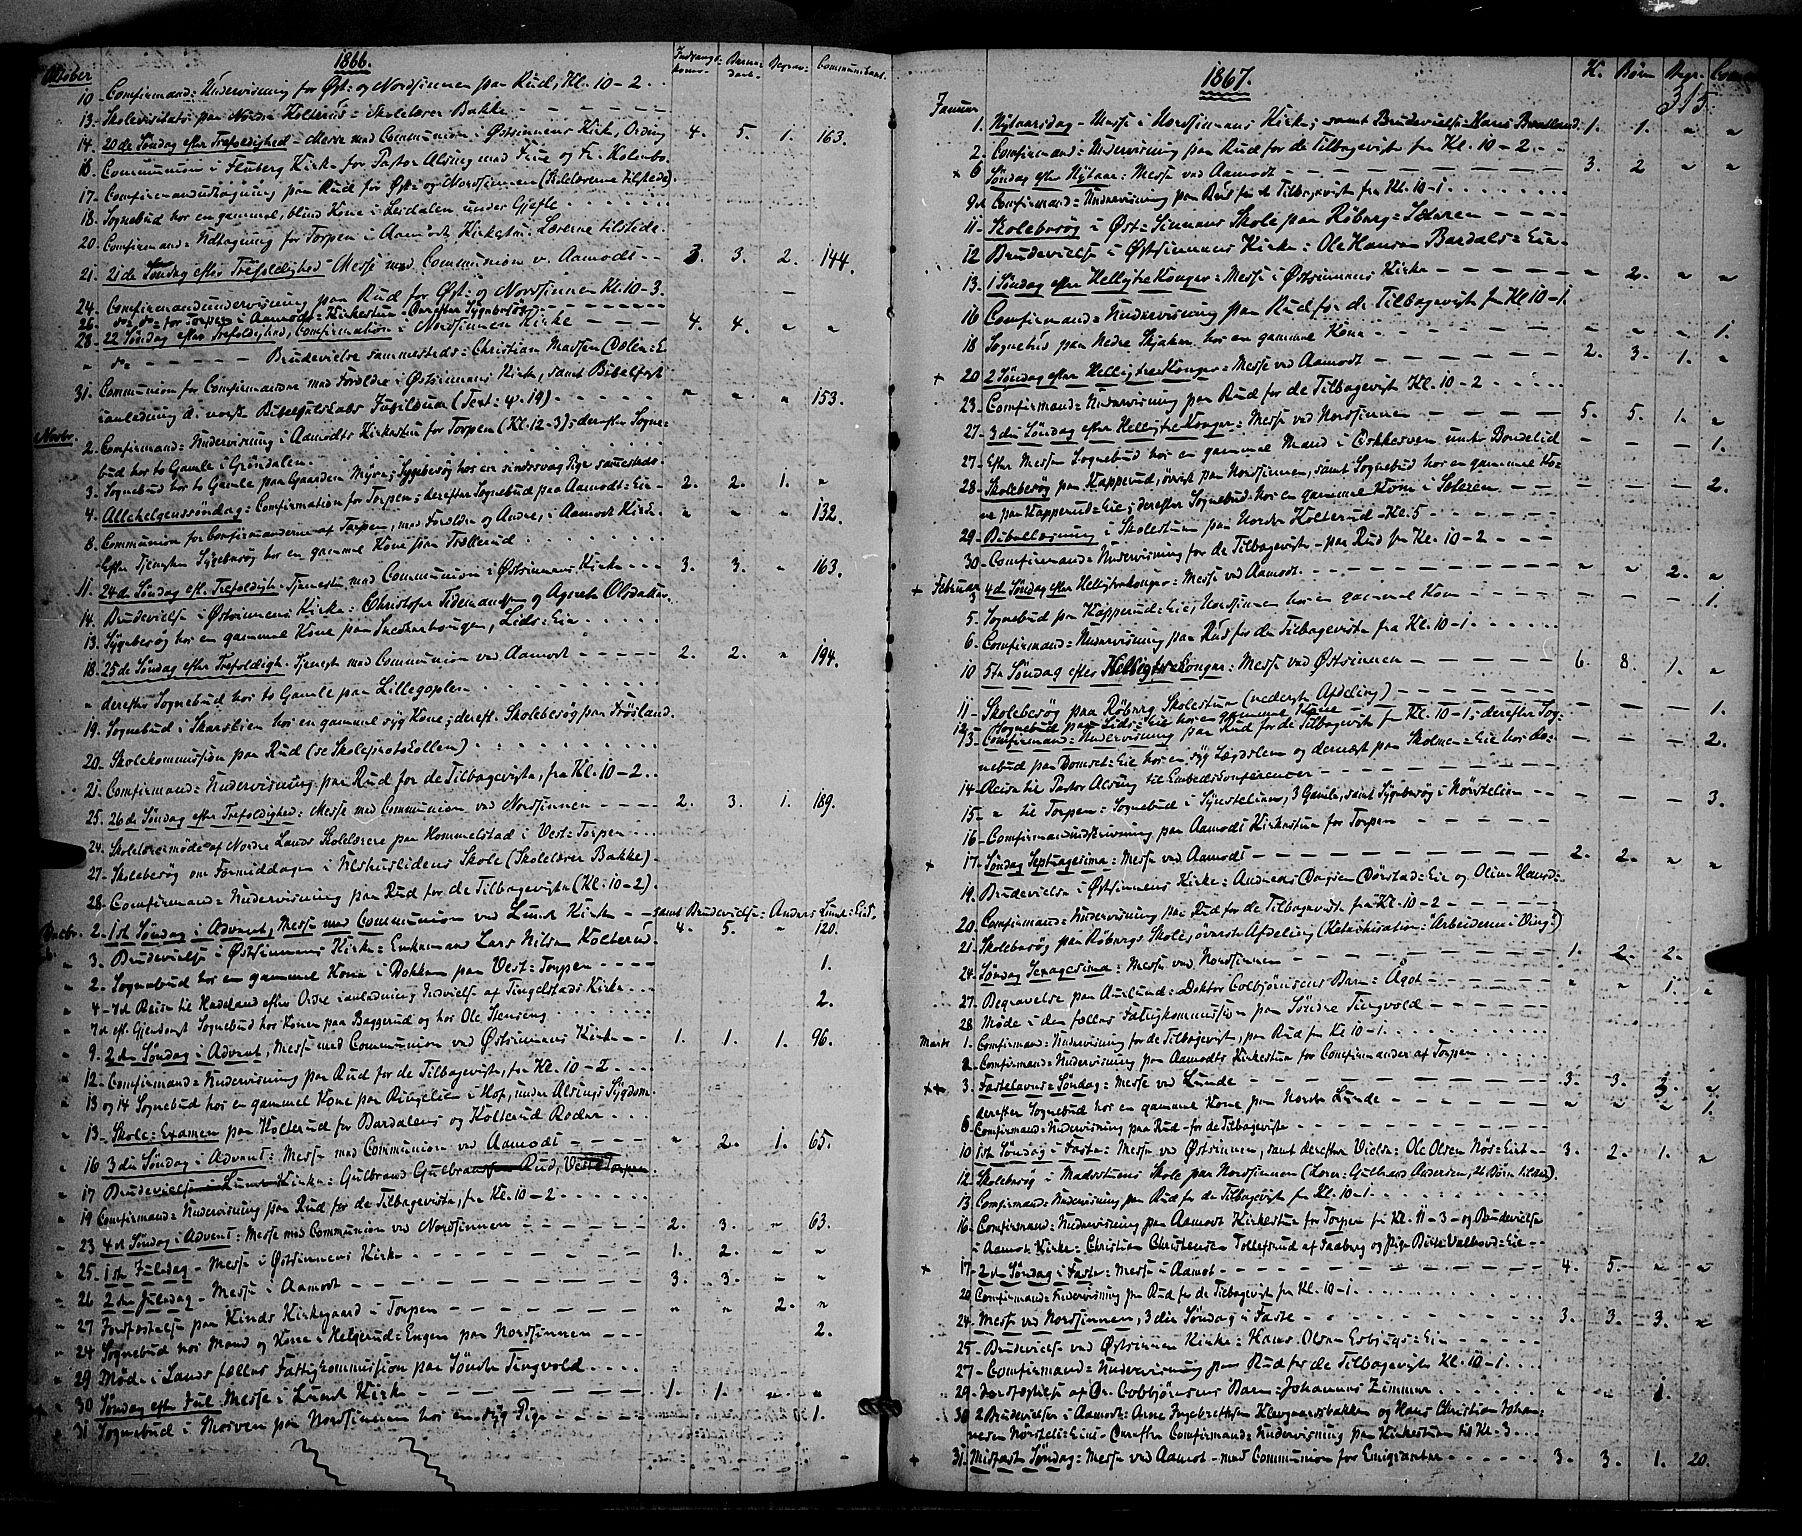 SAH, Nordre Land prestekontor, Ministerialbok nr. 1, 1860-1871, s. 315